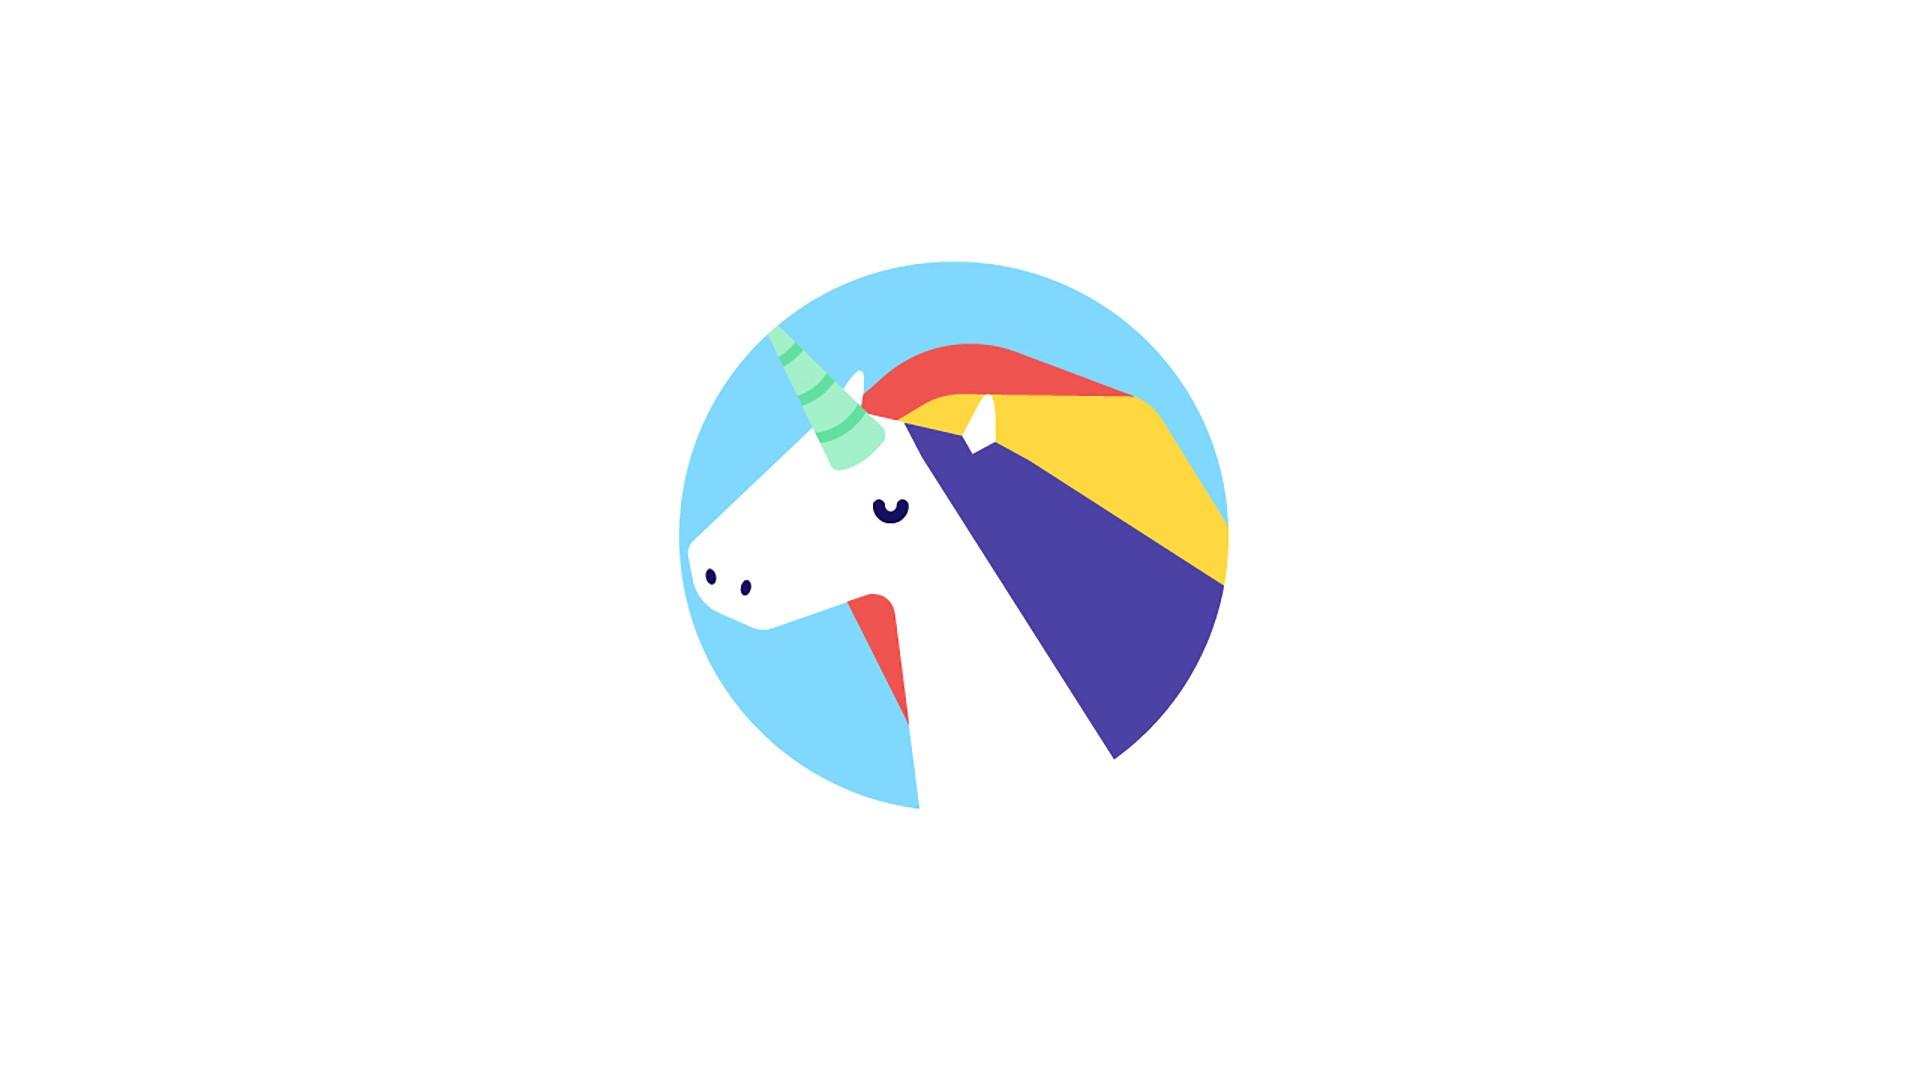 General 1920x1080 minimalism unicorn simple background